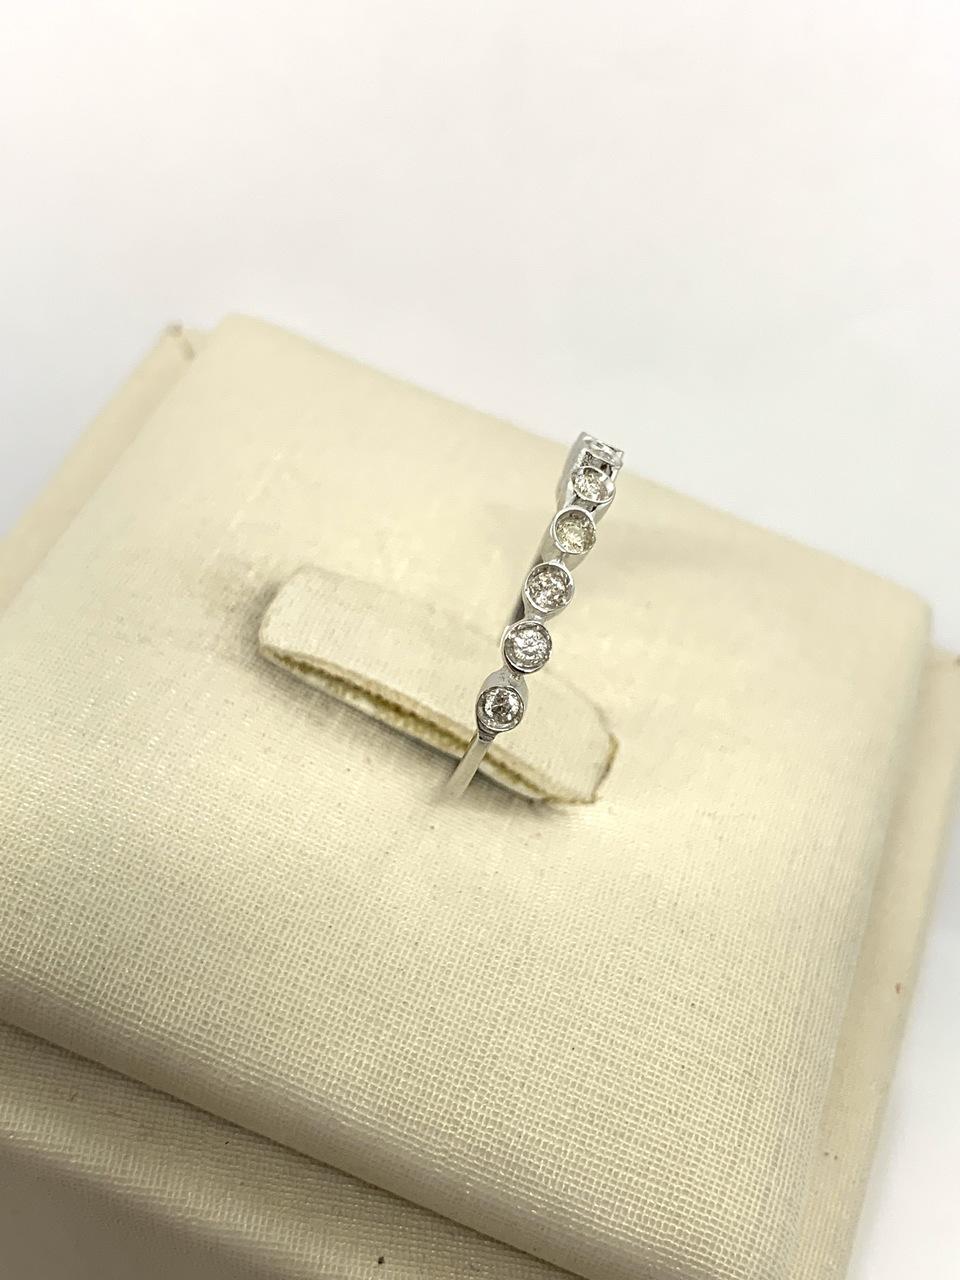 Anel Ouro 18k Ouro Branco com Pedras Jjoias Premium